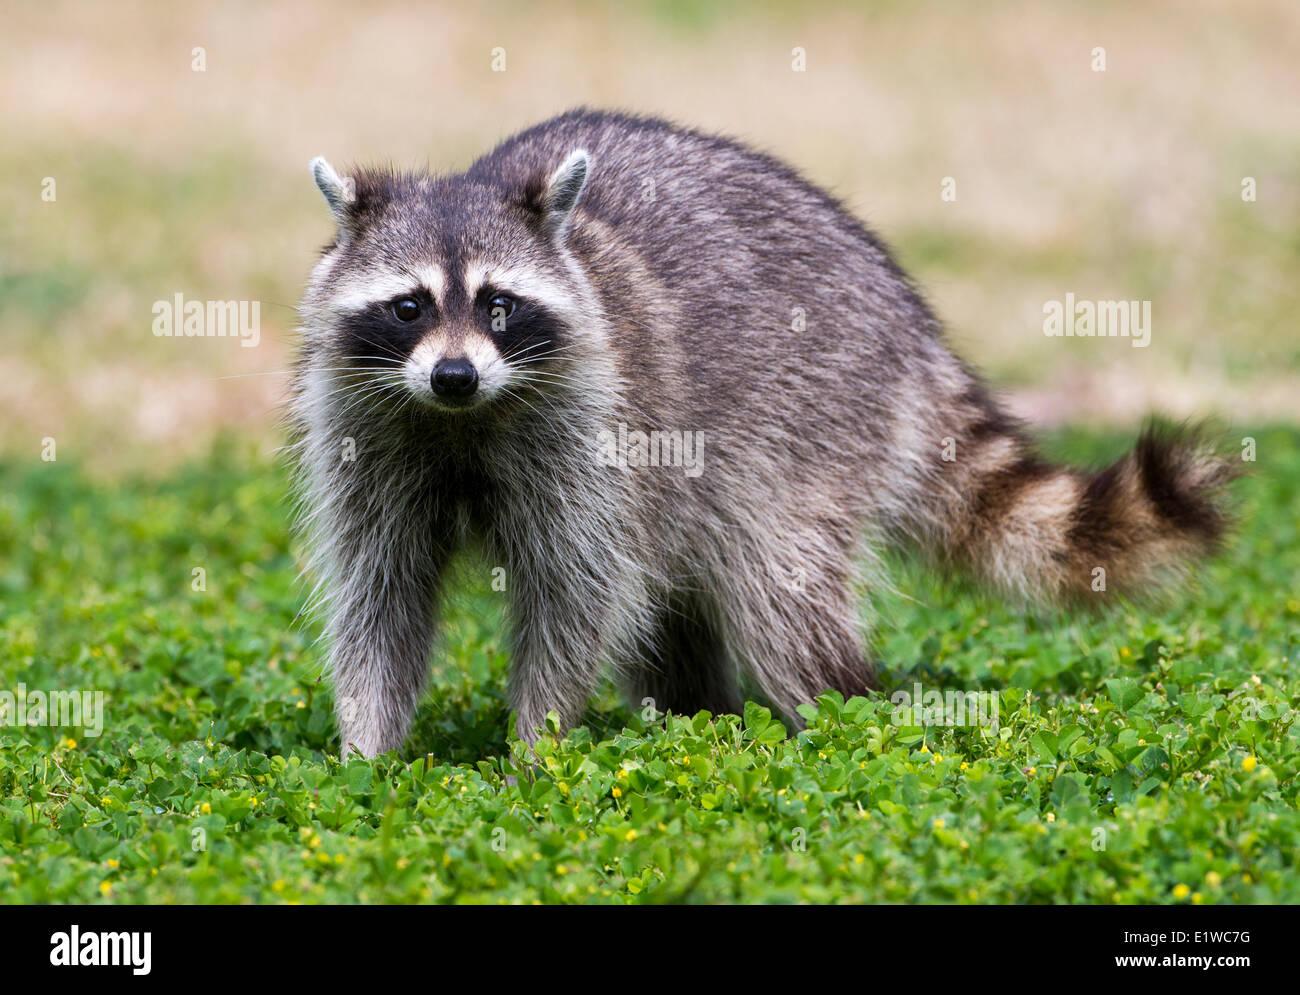 Raccoon (Procione lotor) - Fort Desoto parco statale, Florida Immagini Stock